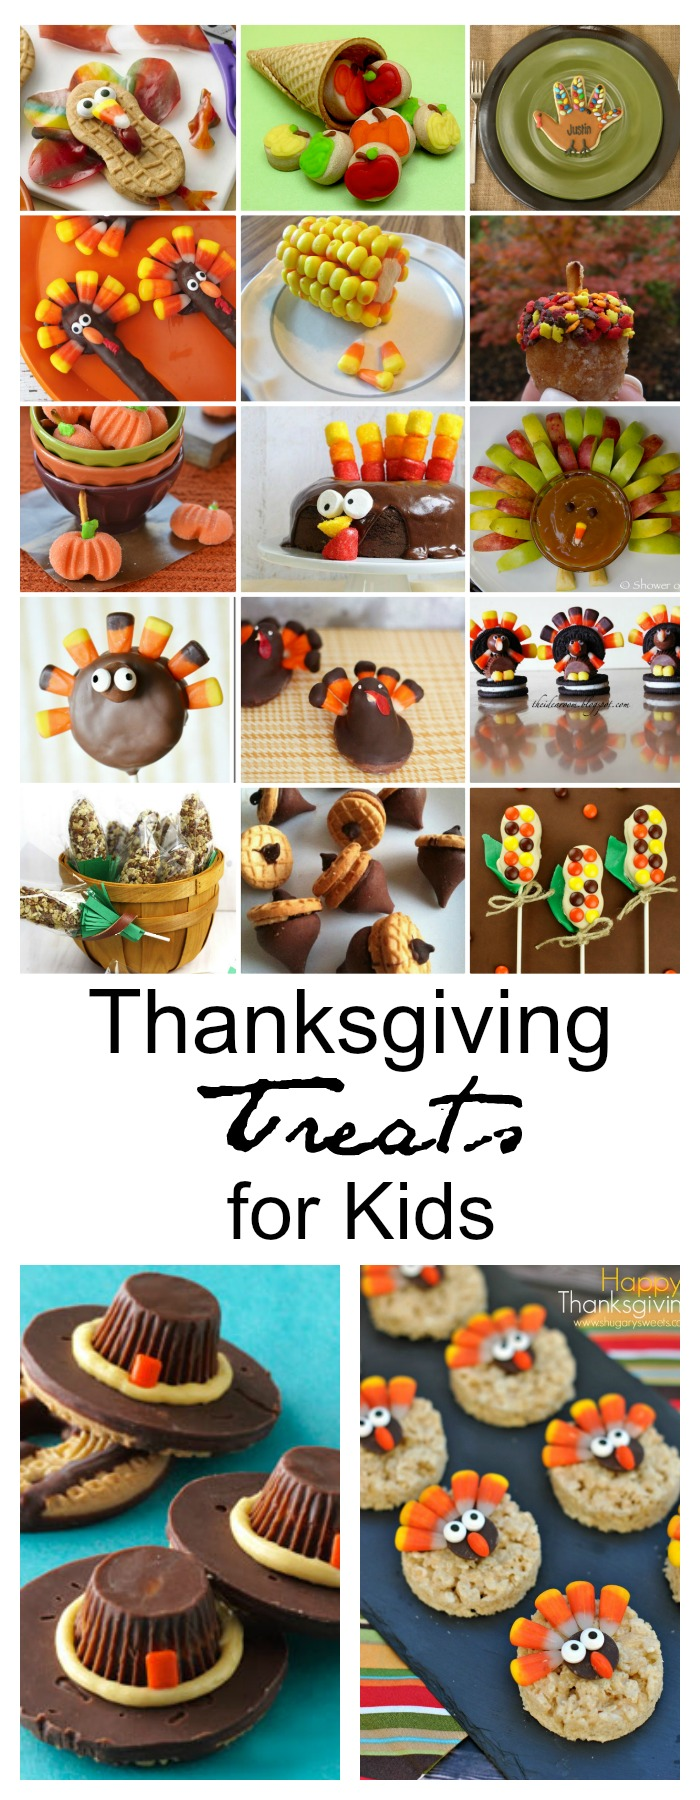 Thanksgiving-Treats-Kids-Pin